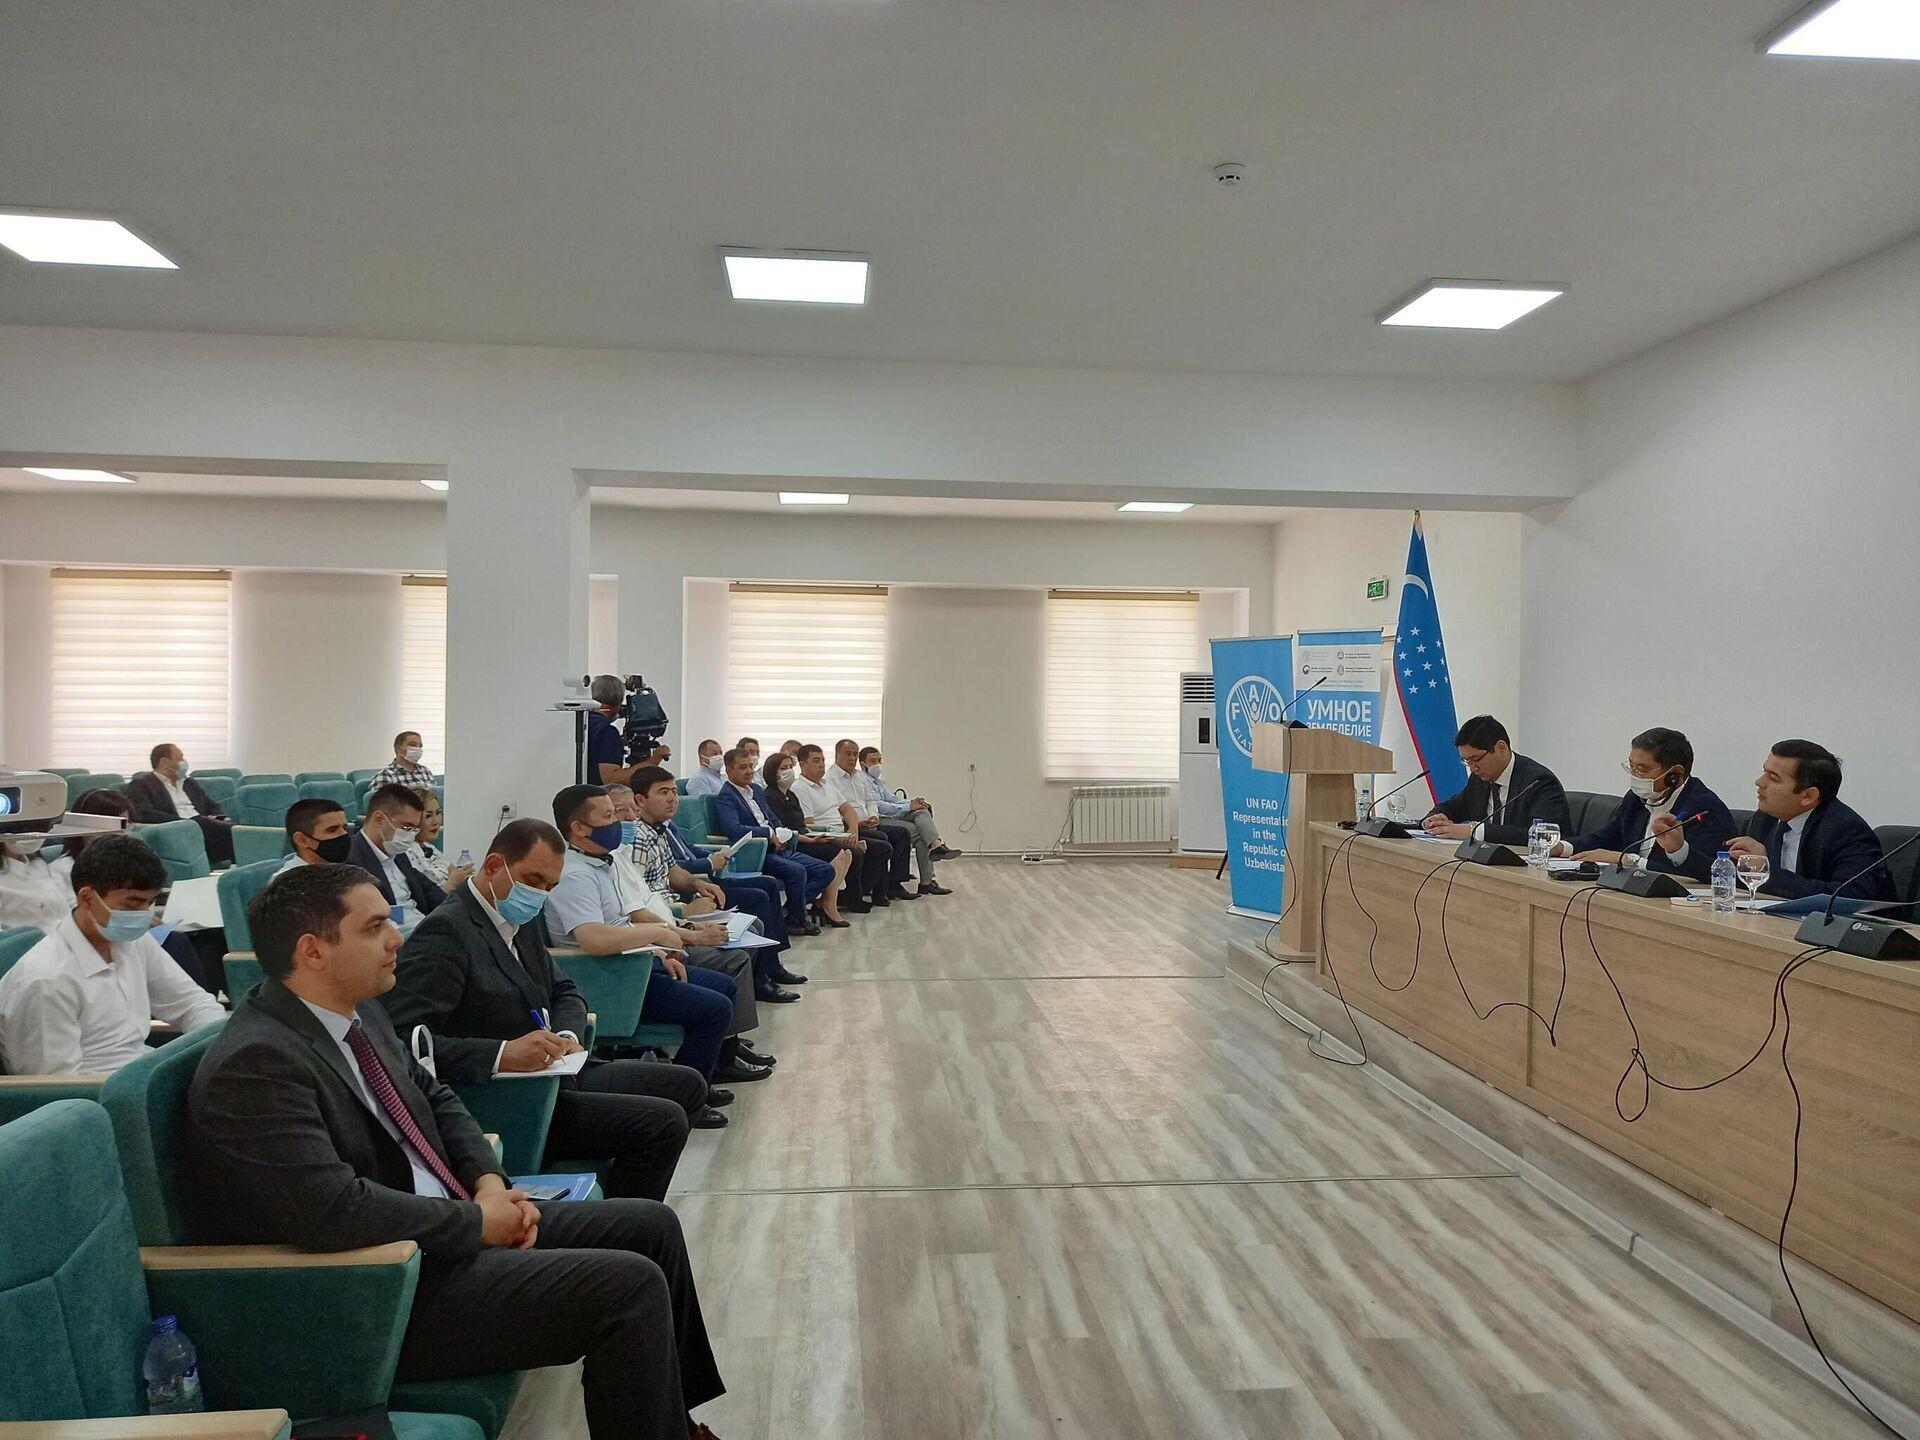 В Узбекистане запустили четырехлетний проект ФАО Умное фермерство - Sputnik Узбекистан, 1920, 19.05.2021